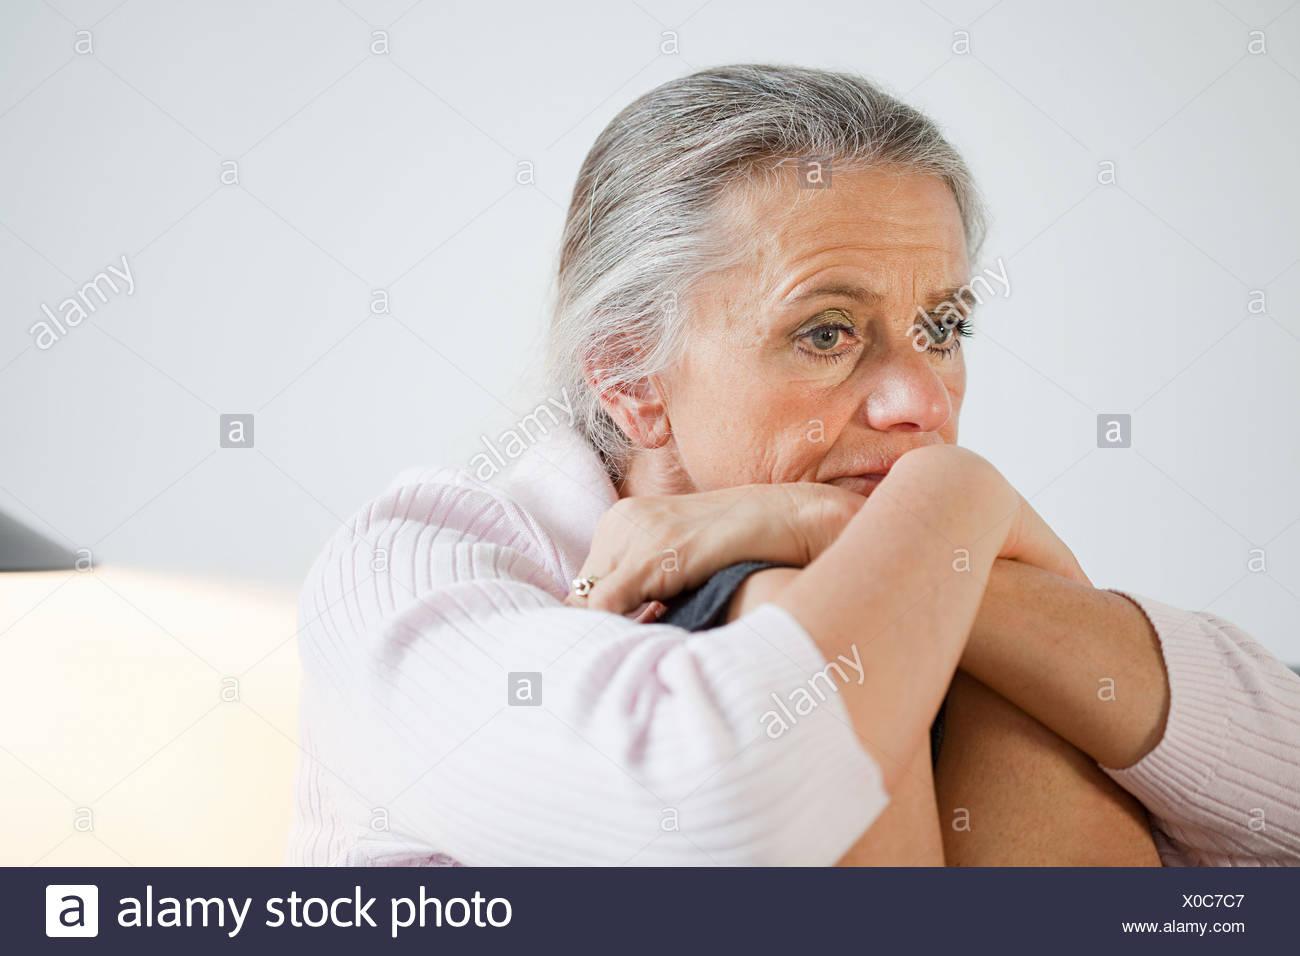 Mature woman looking anxious - Stock Image